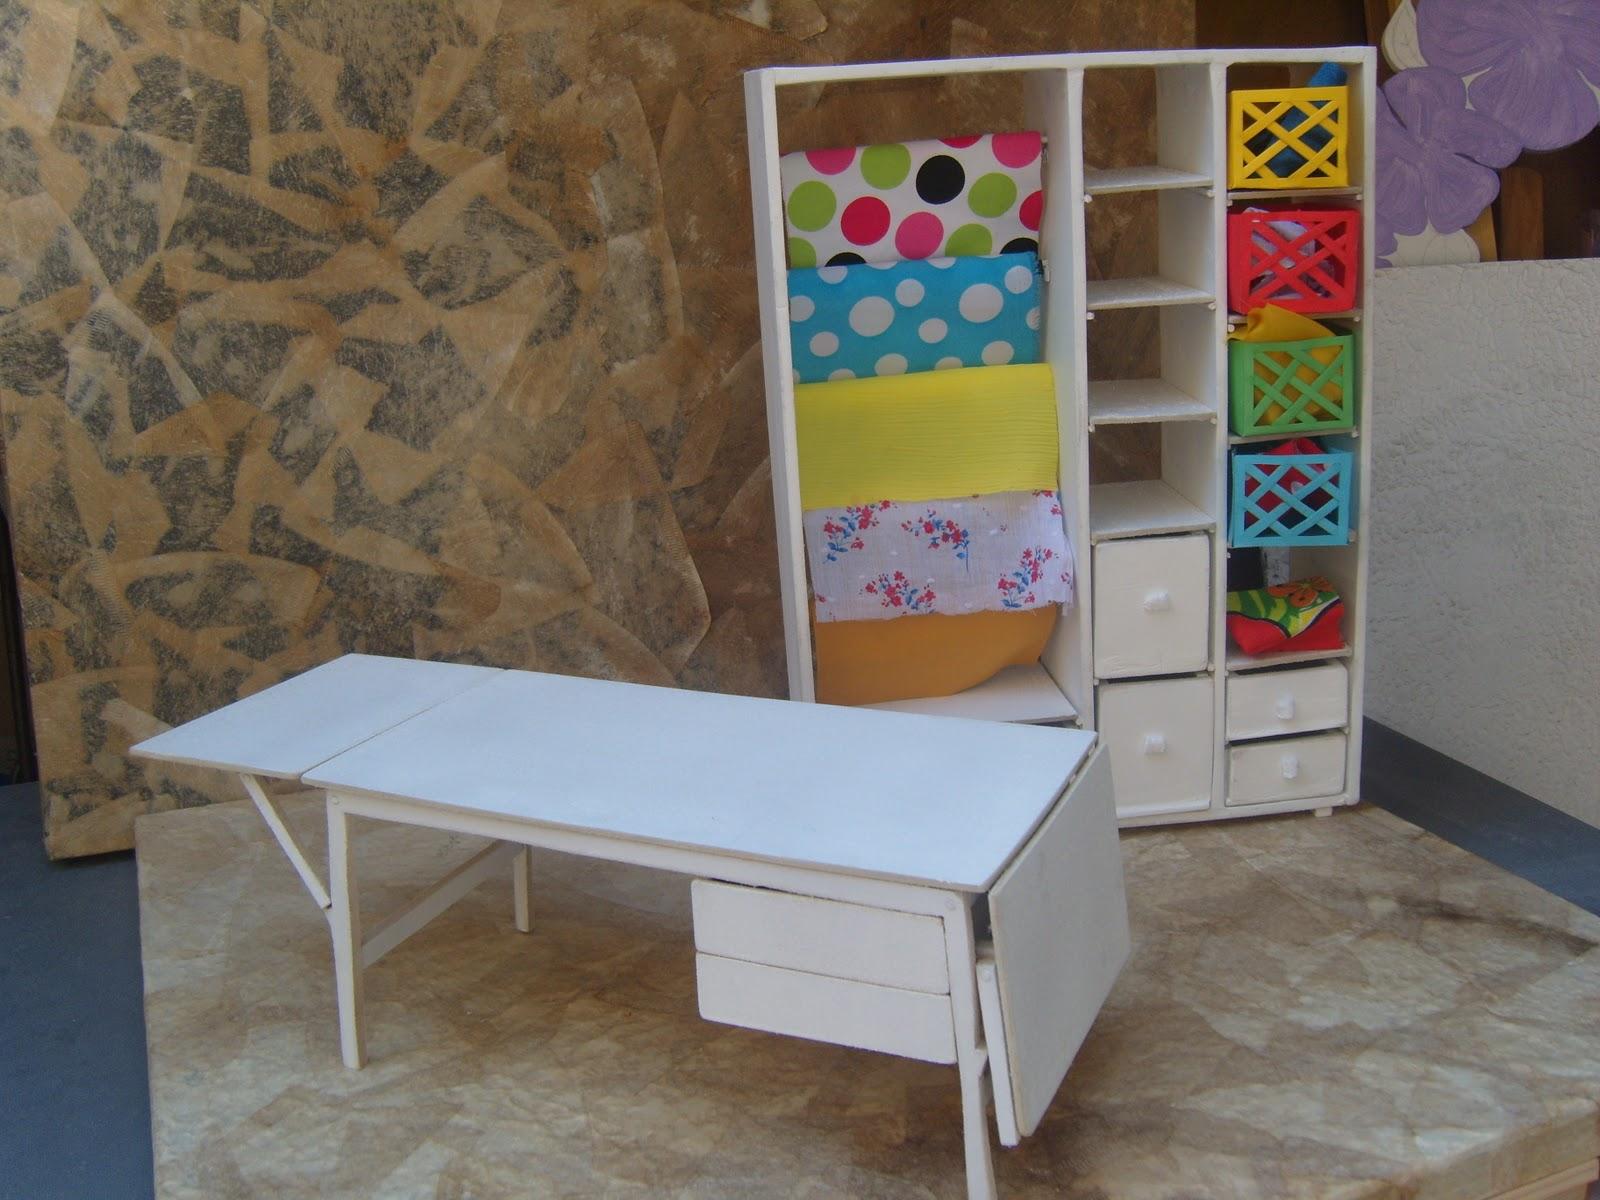 Lion studio art 39 s mockup de mesa funcional e estante p - Mesas para costura ...